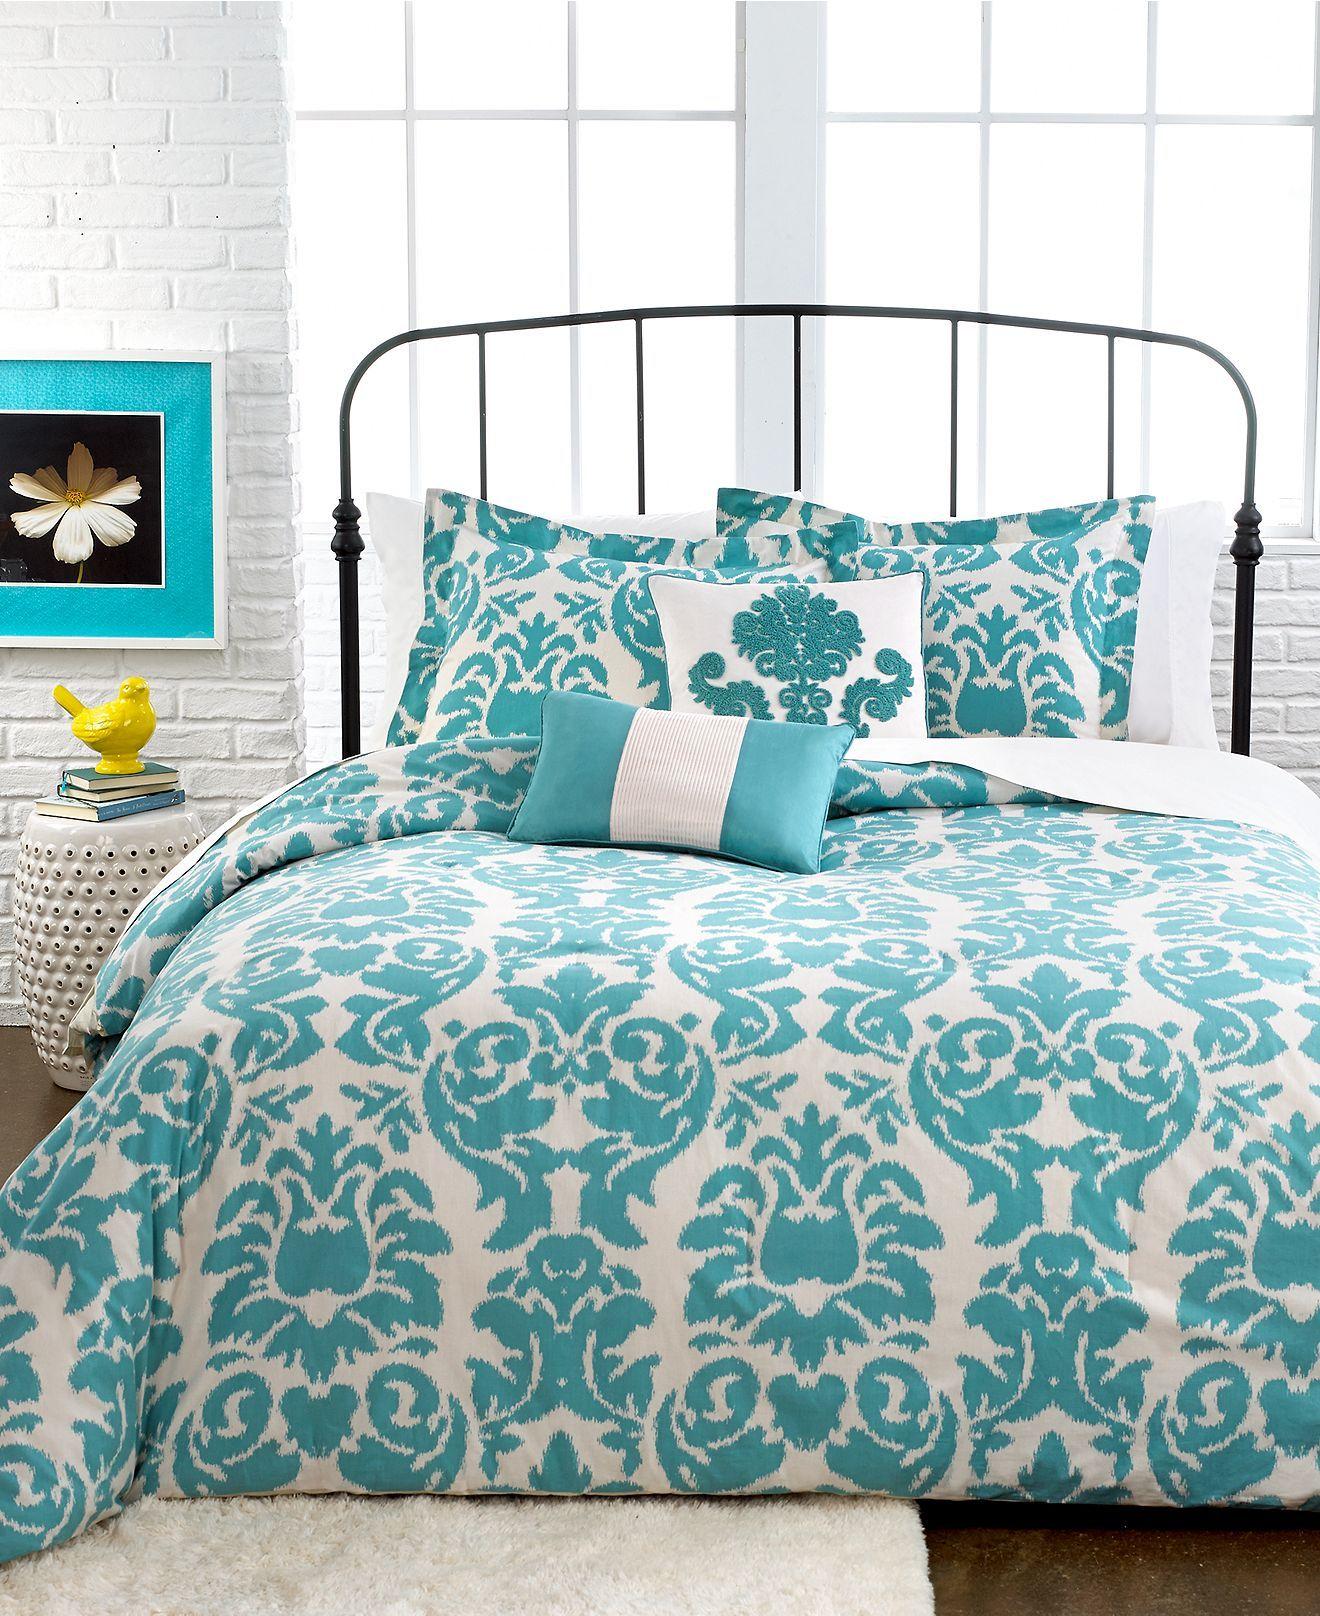 Turquoise Bedding Comforter Sets Queen Comforter Sets